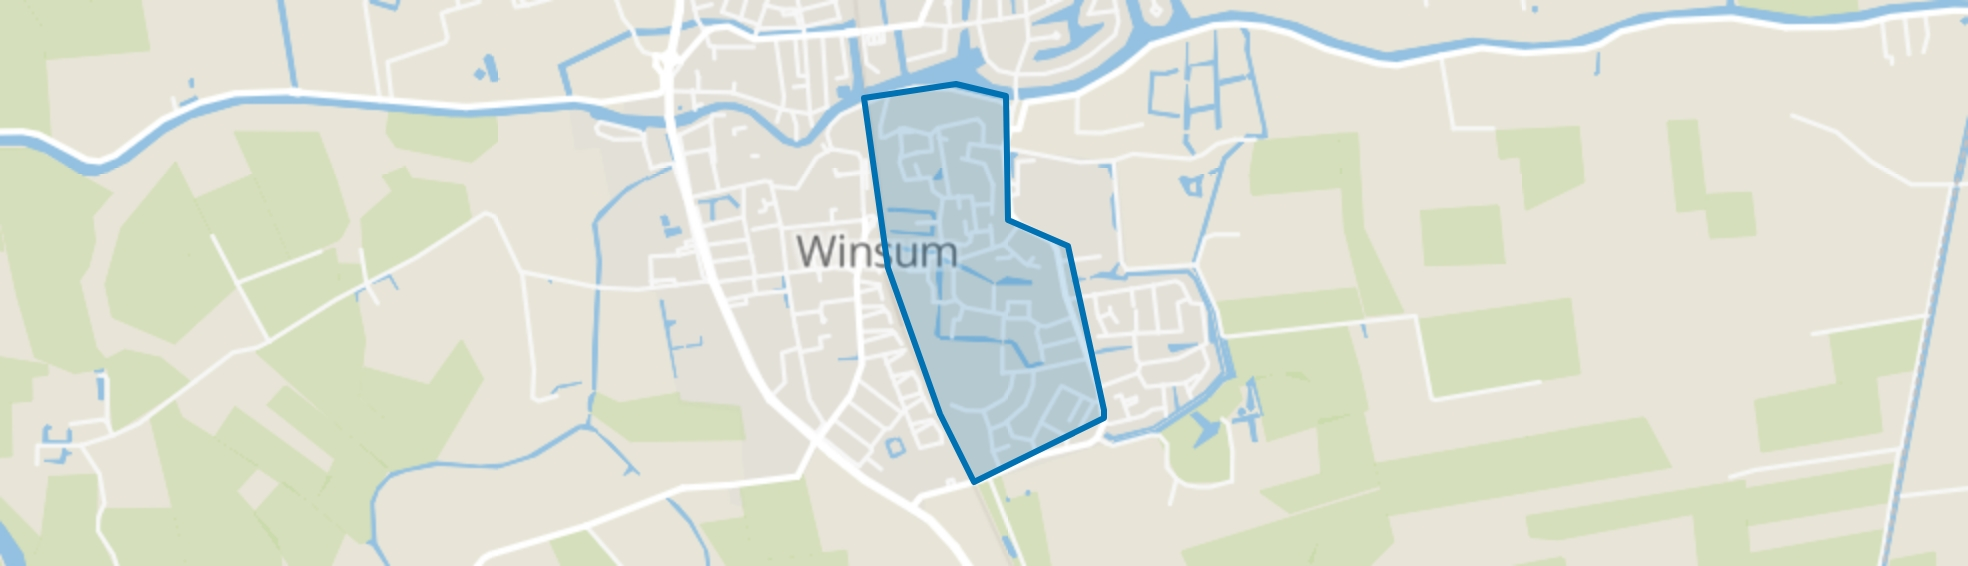 Ripperda, Winsum (GR) map